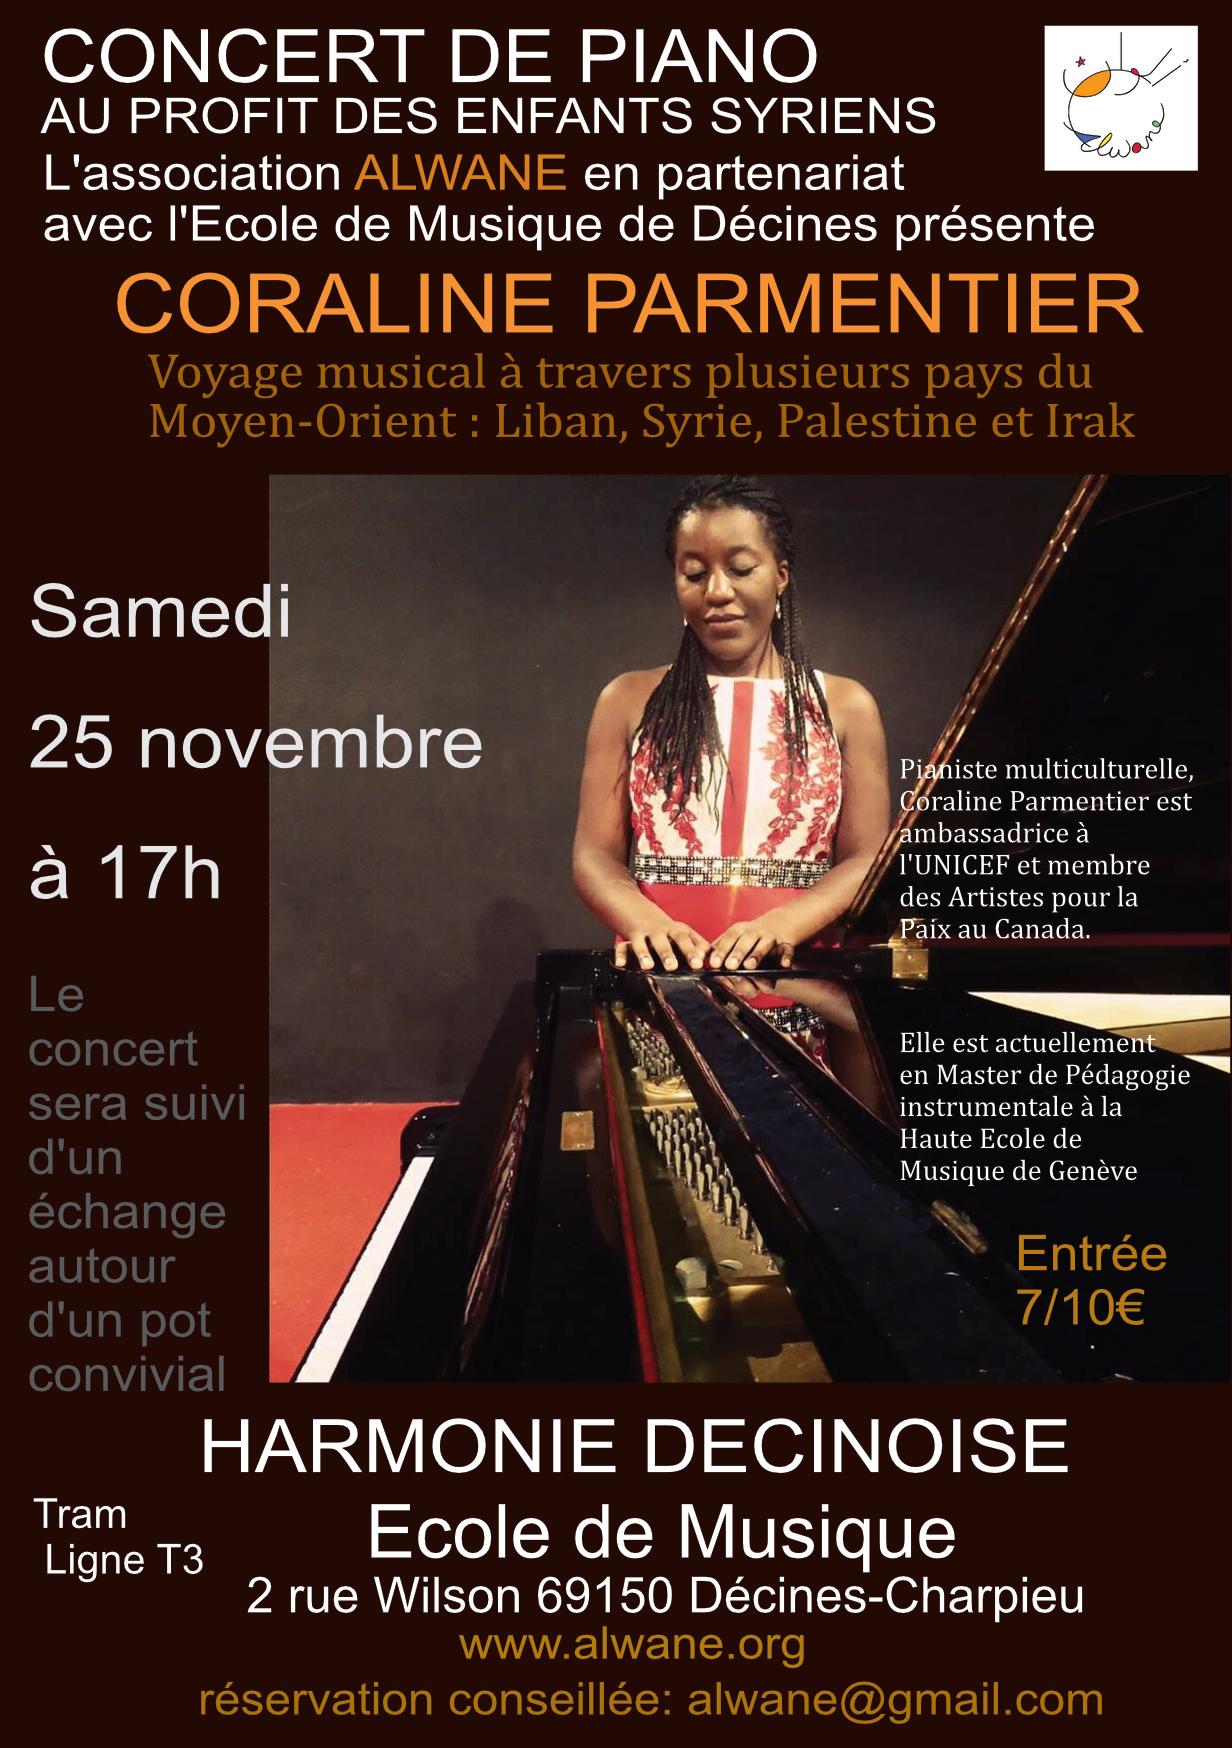 Concert de piano Coraline Parmentier